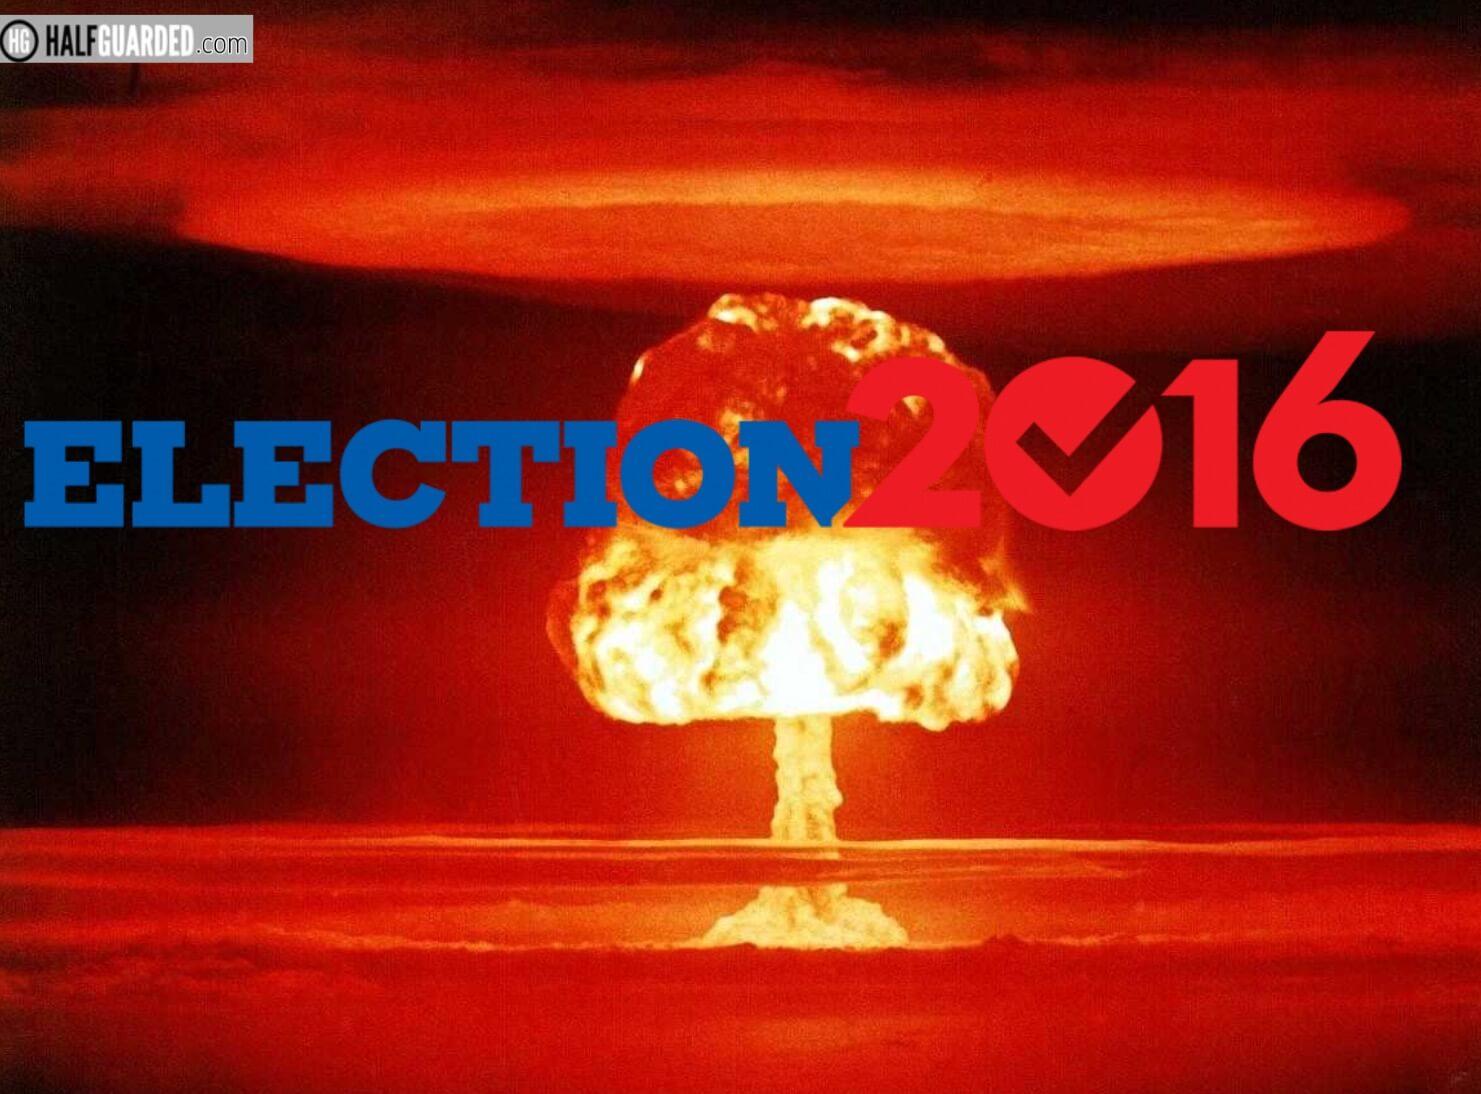 Election doom explosion